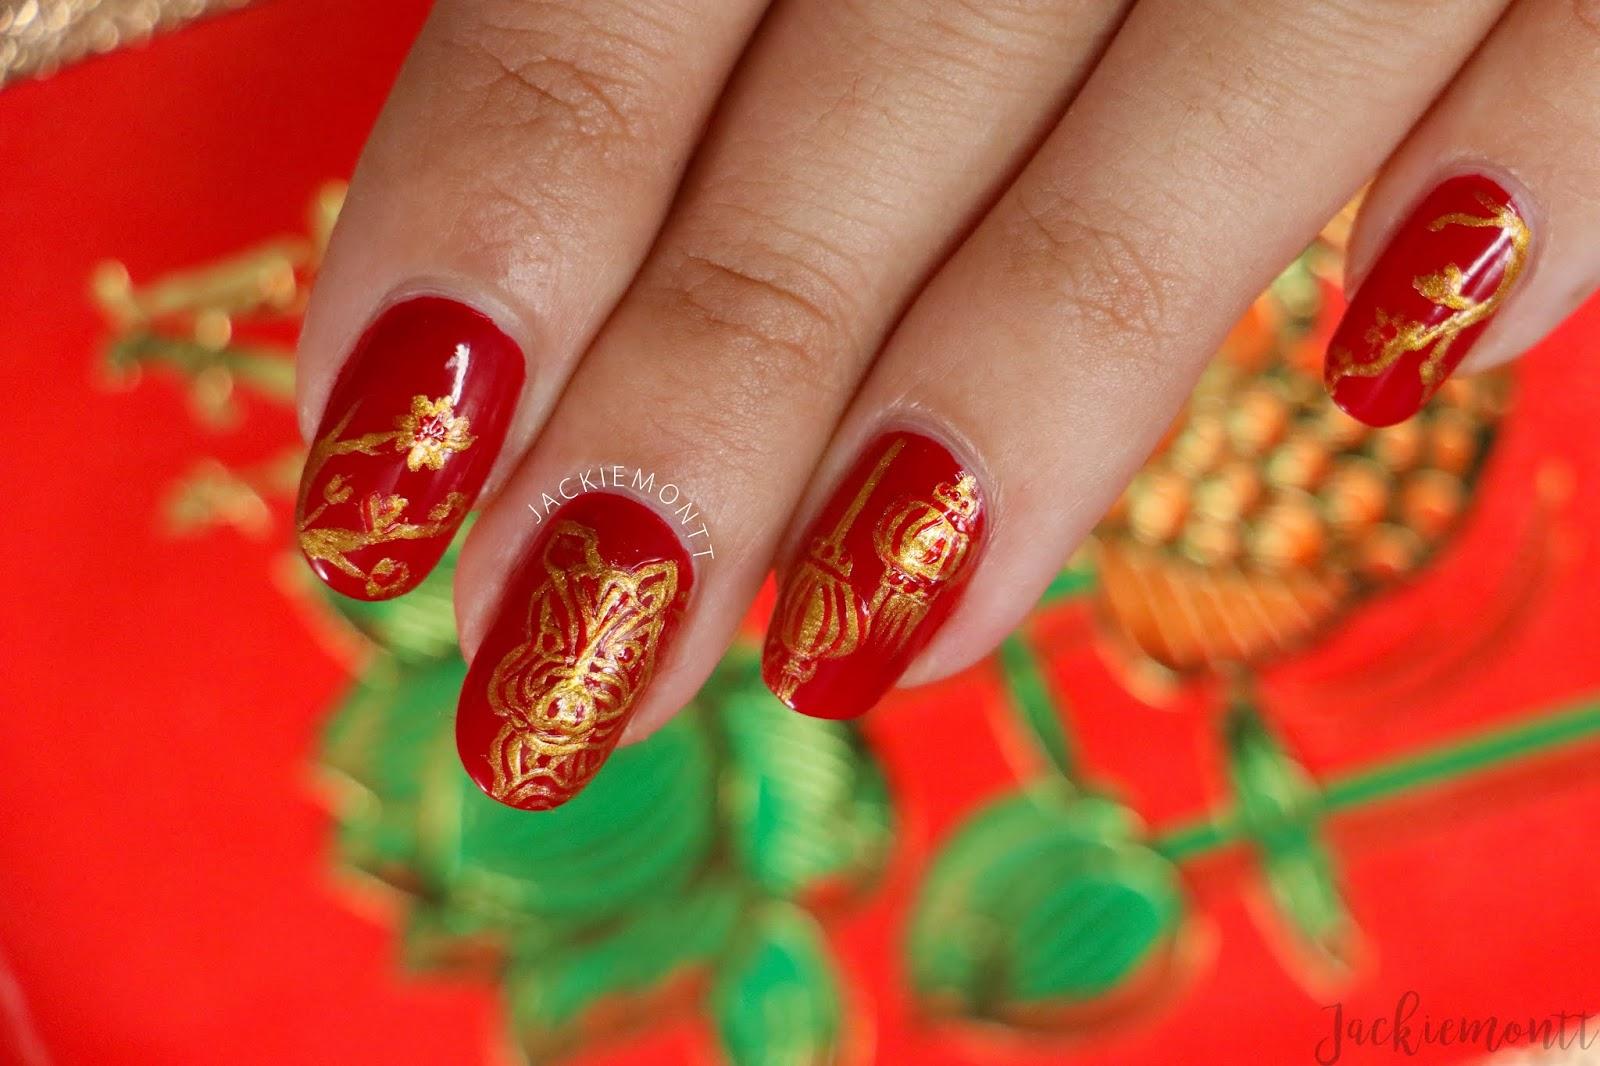 Chinese New Year Nail Art Jackiemontt